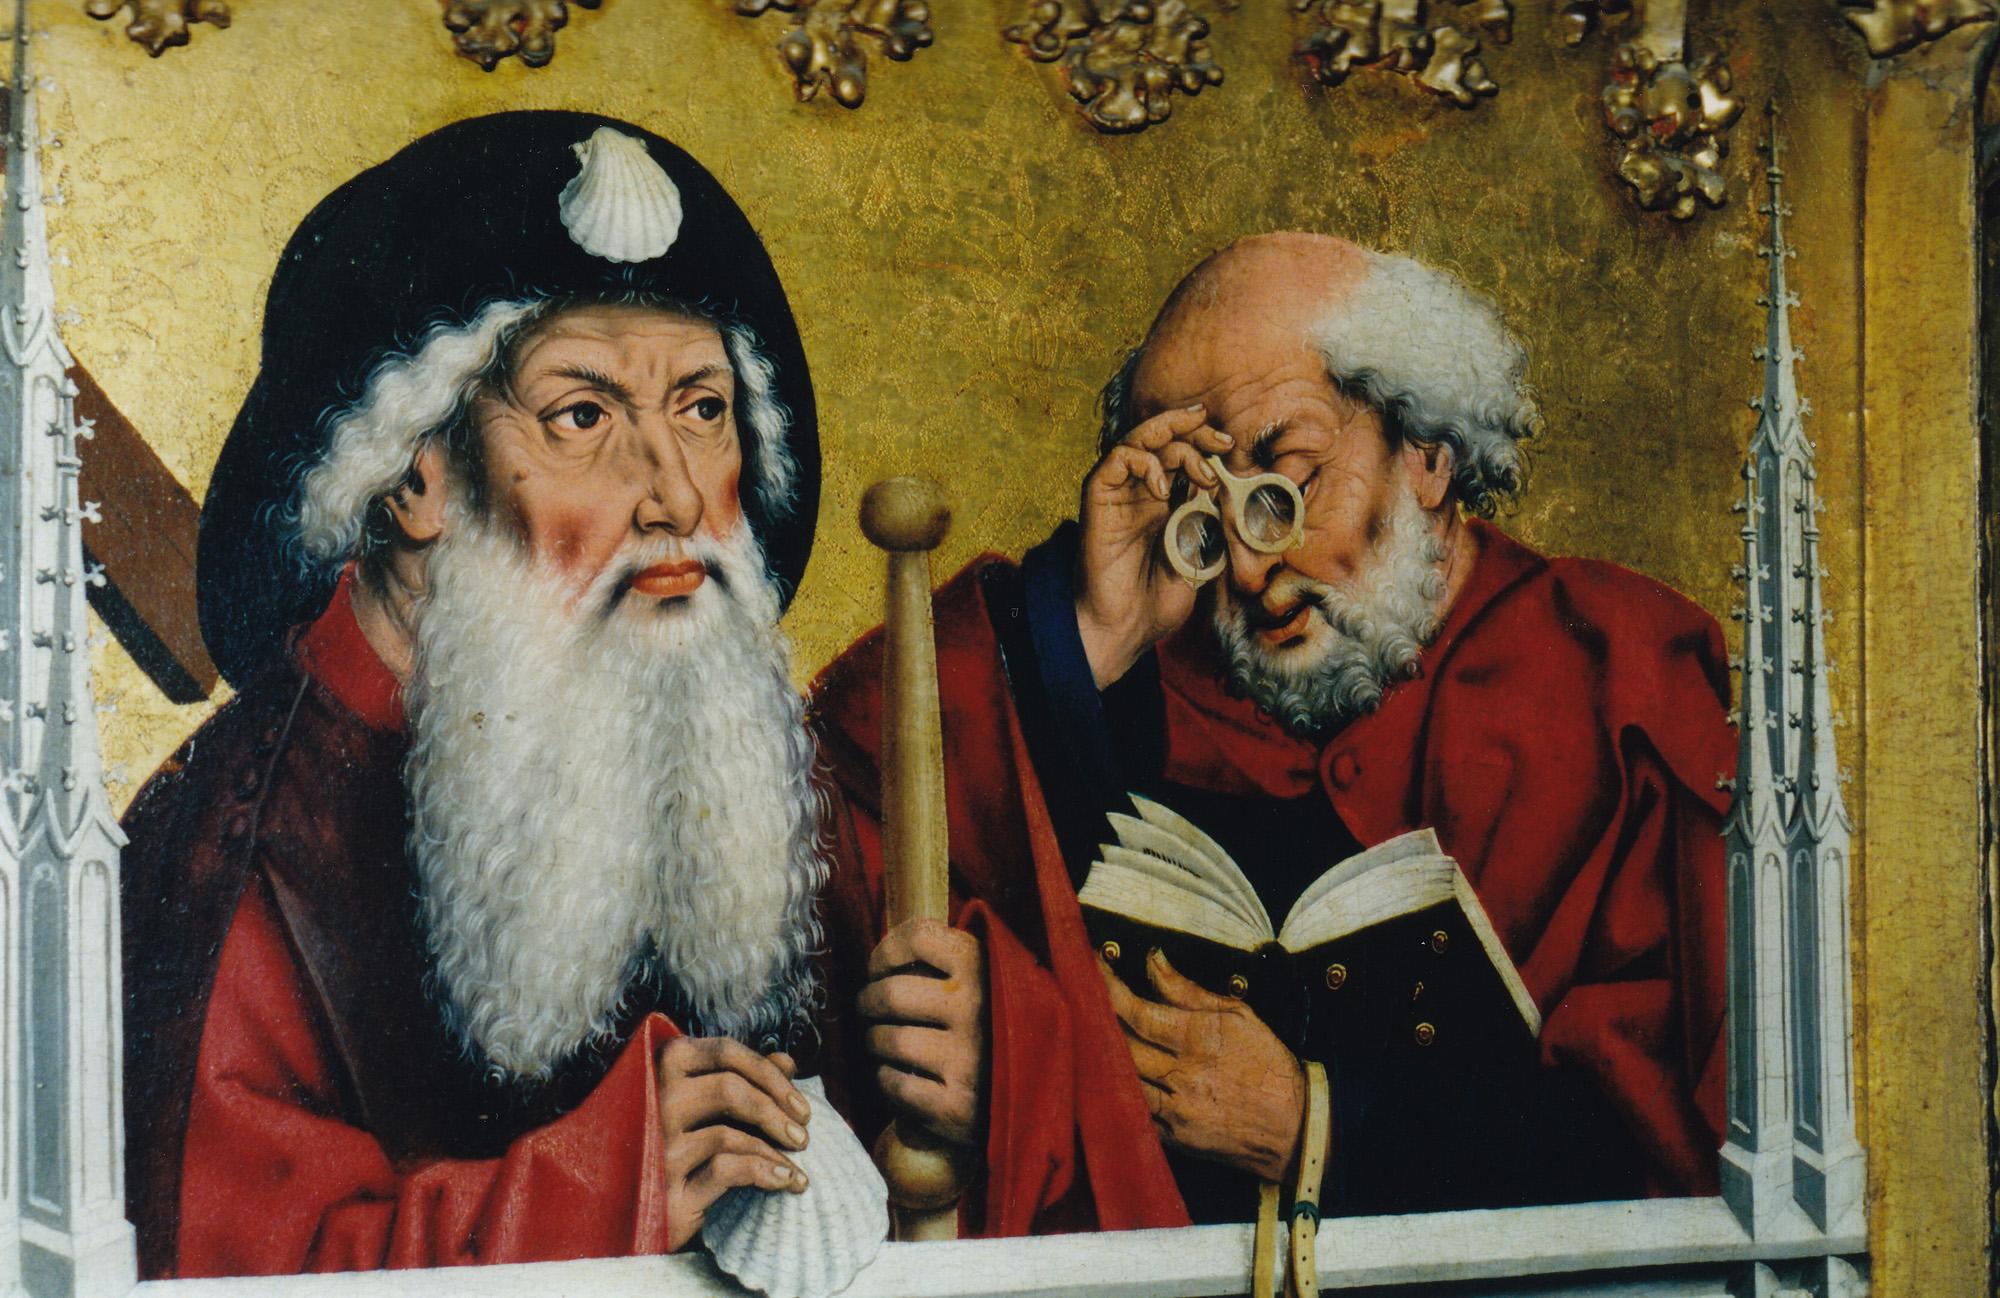 1466 St. Jakob - Petrus